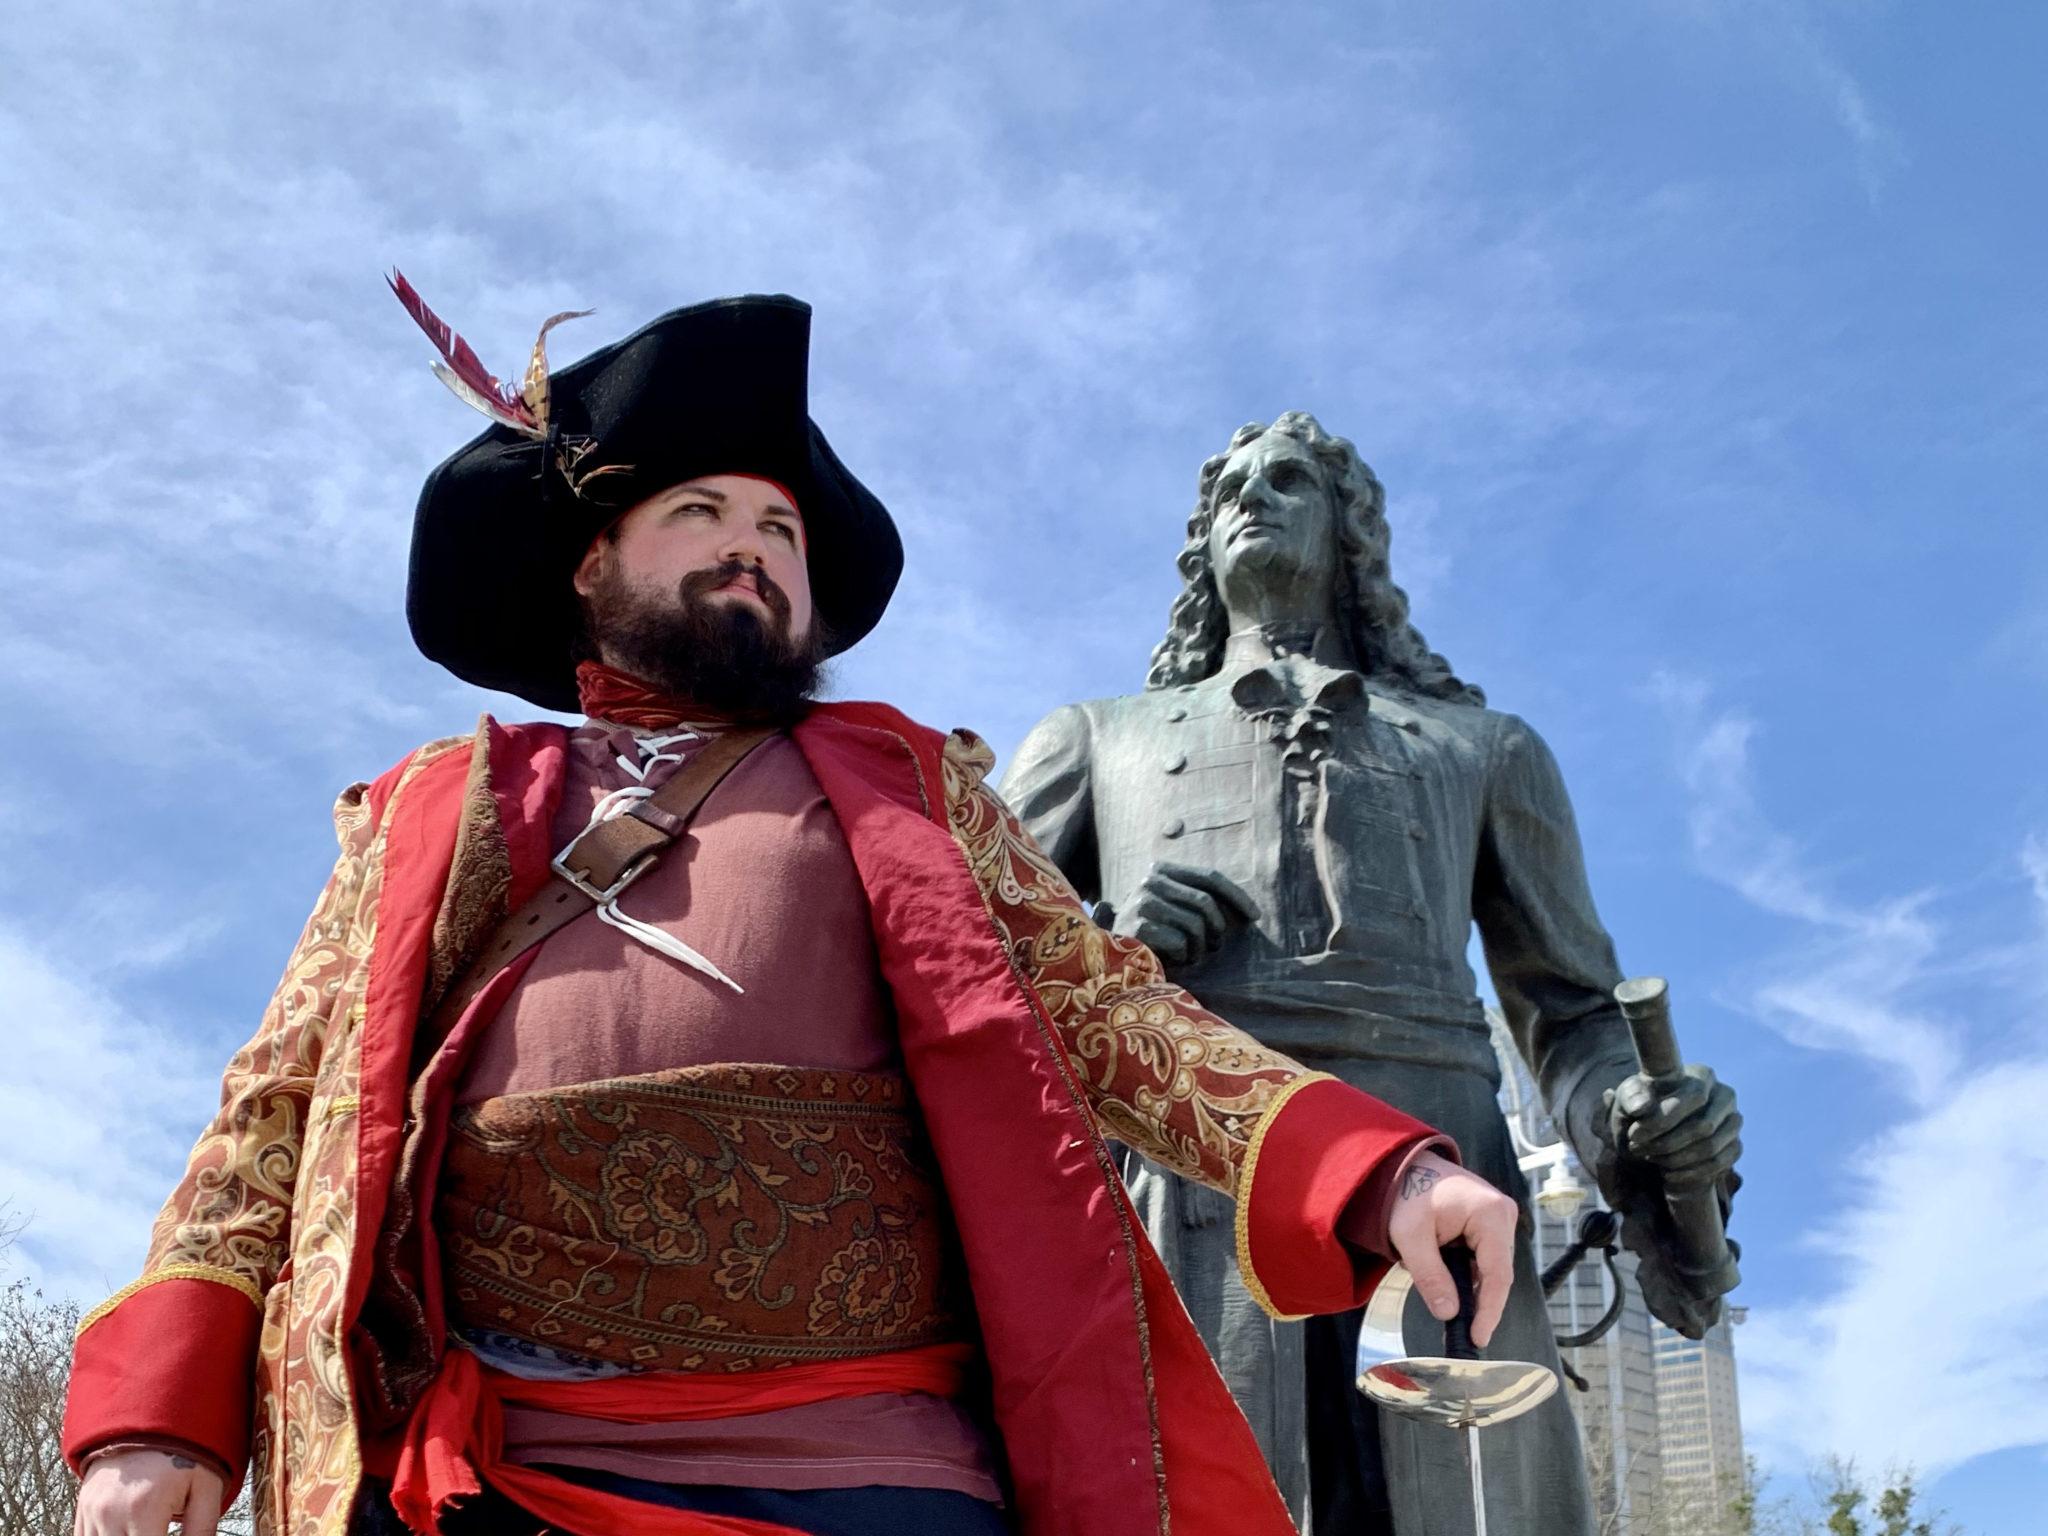 Ahoy Maties: September 19 is International Talk Like a Pirate Day